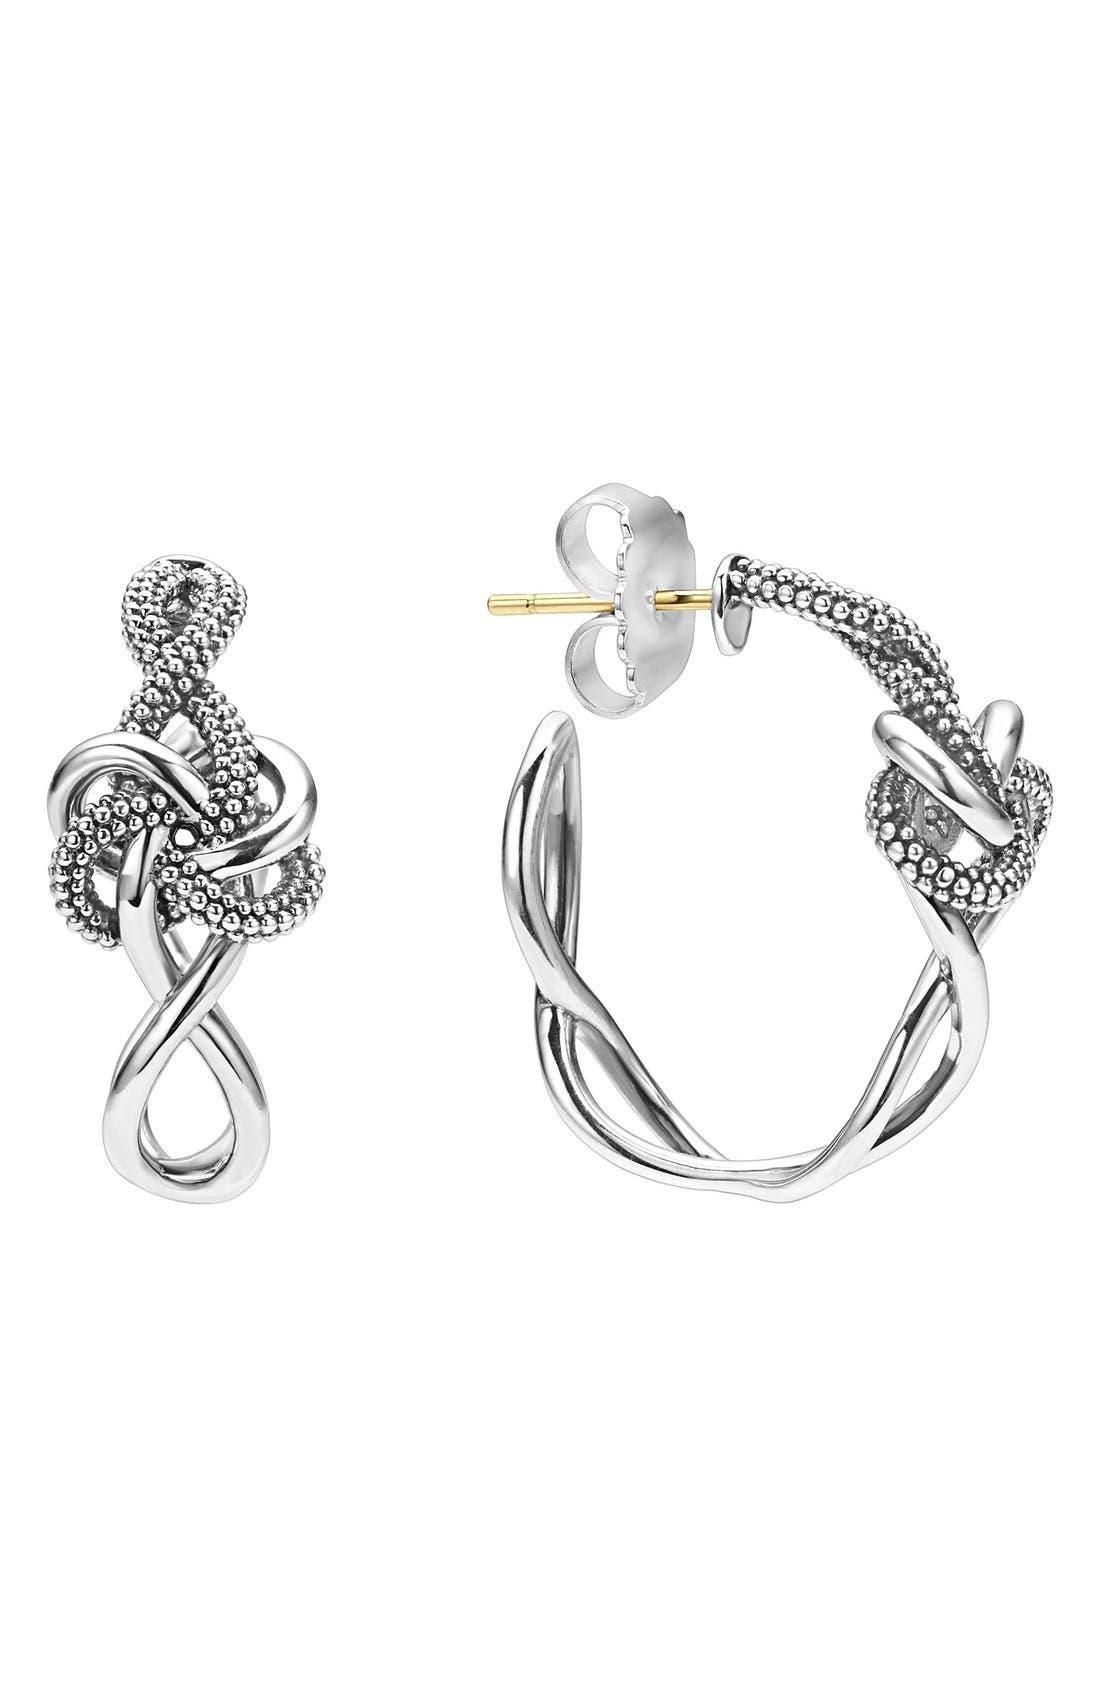 'Love Knot' Hoop Earrings,                             Main thumbnail 1, color,                             STERLING SILVER